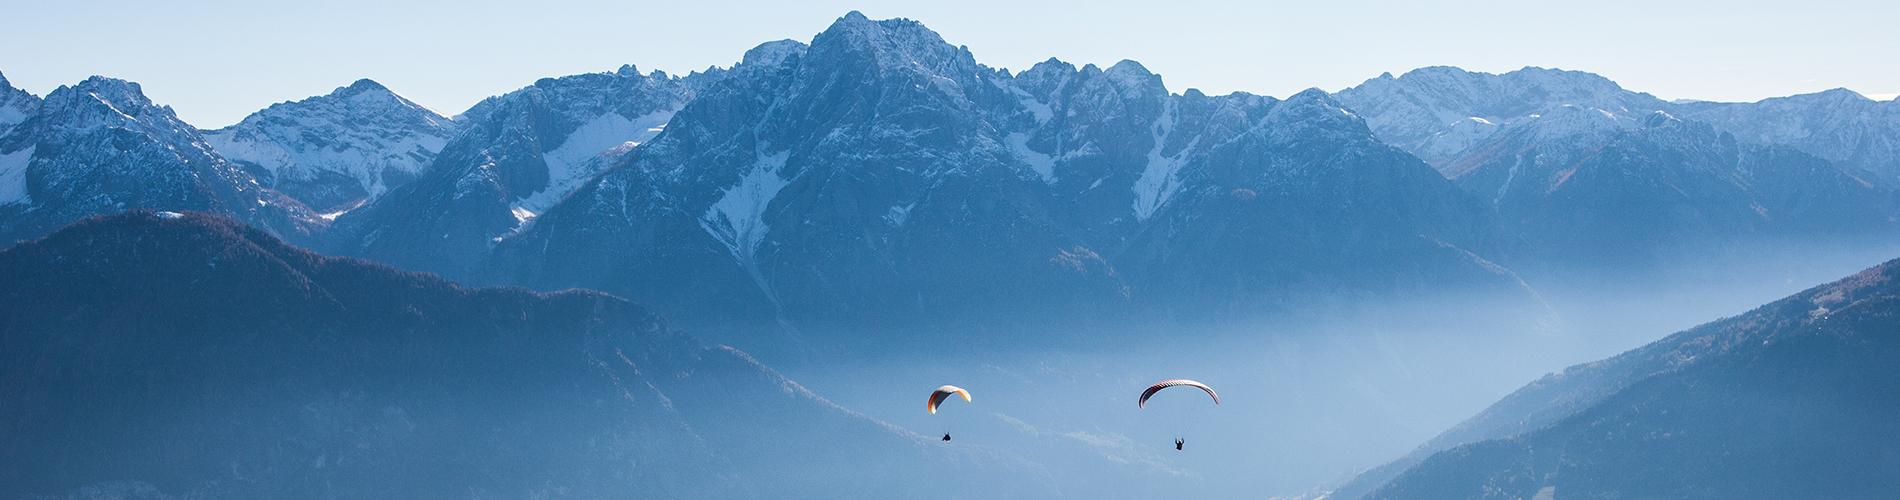 slider-1900x500_tandem-paragliding-austria_006